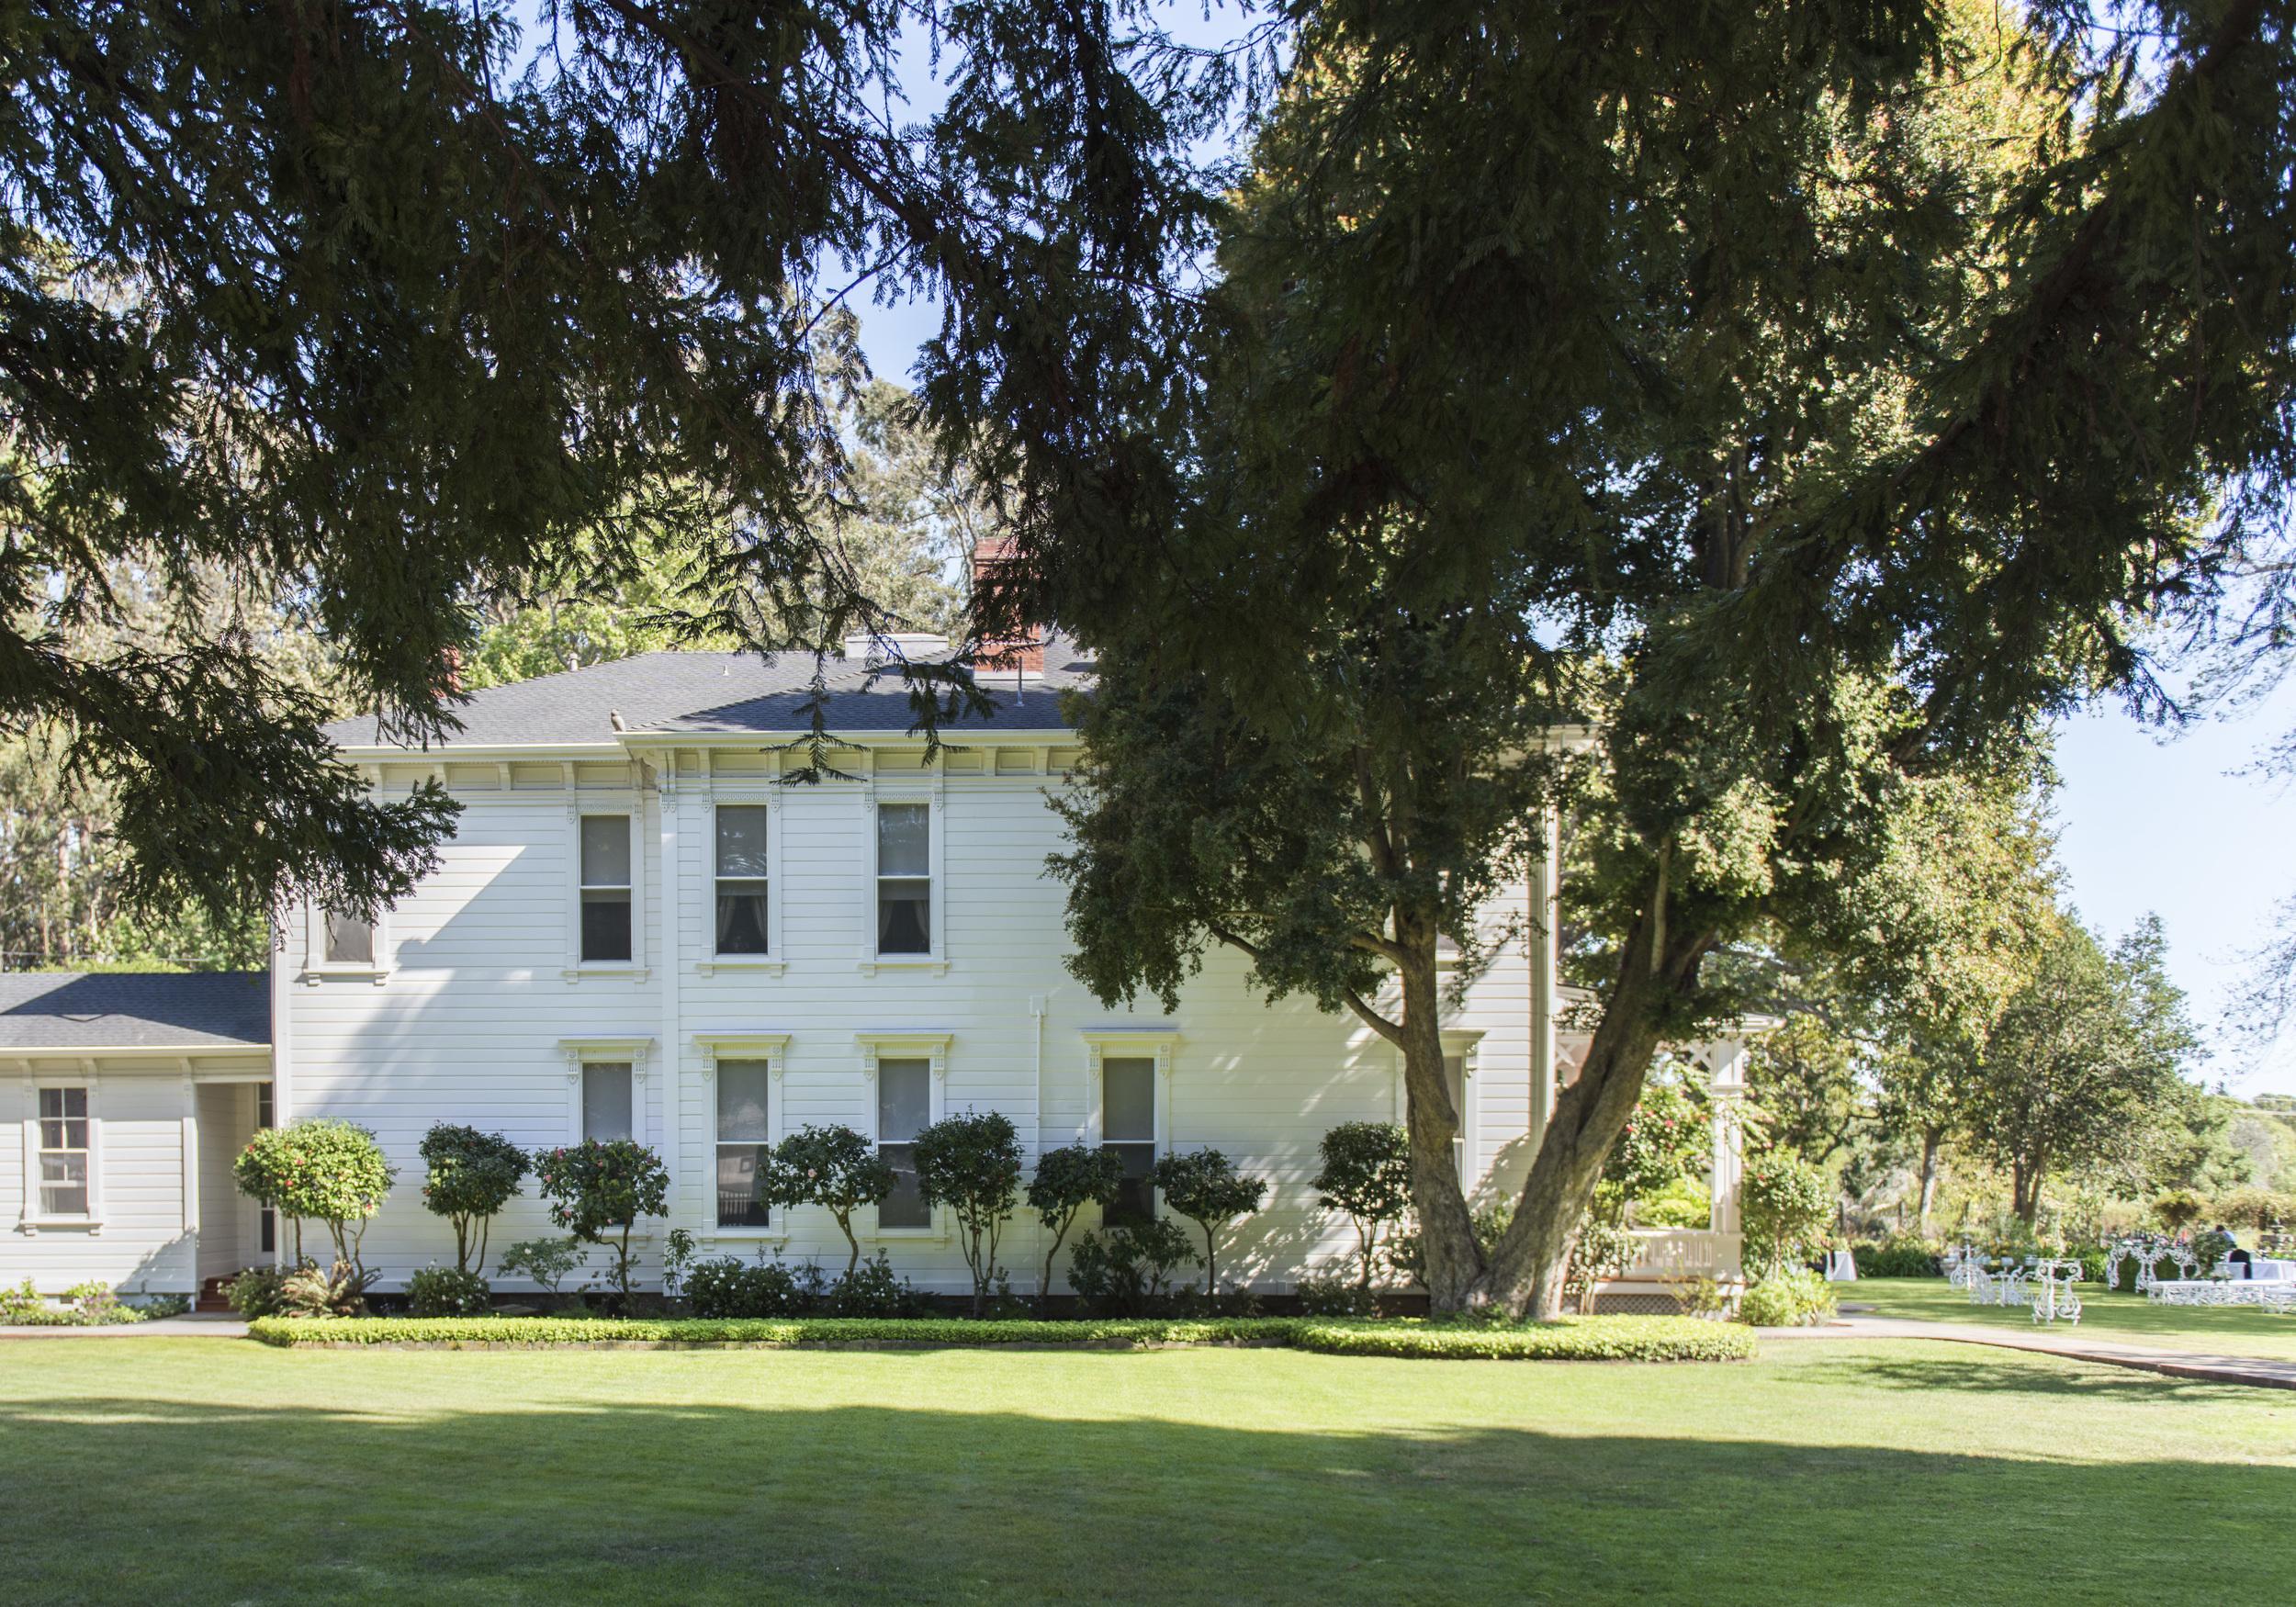 Casa de Perrin | Hearst Castle 12.jpg